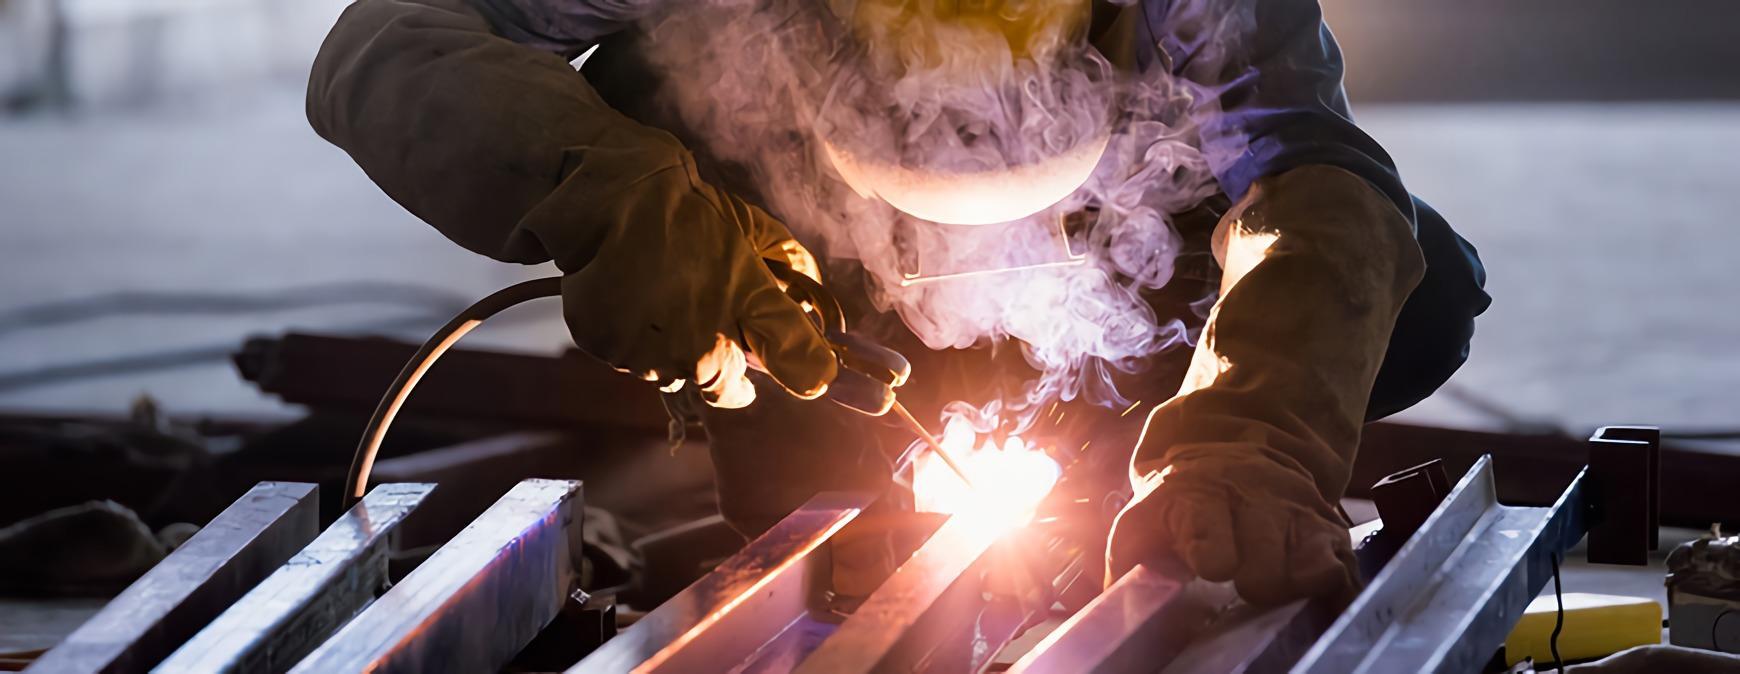 welding career skilled trade